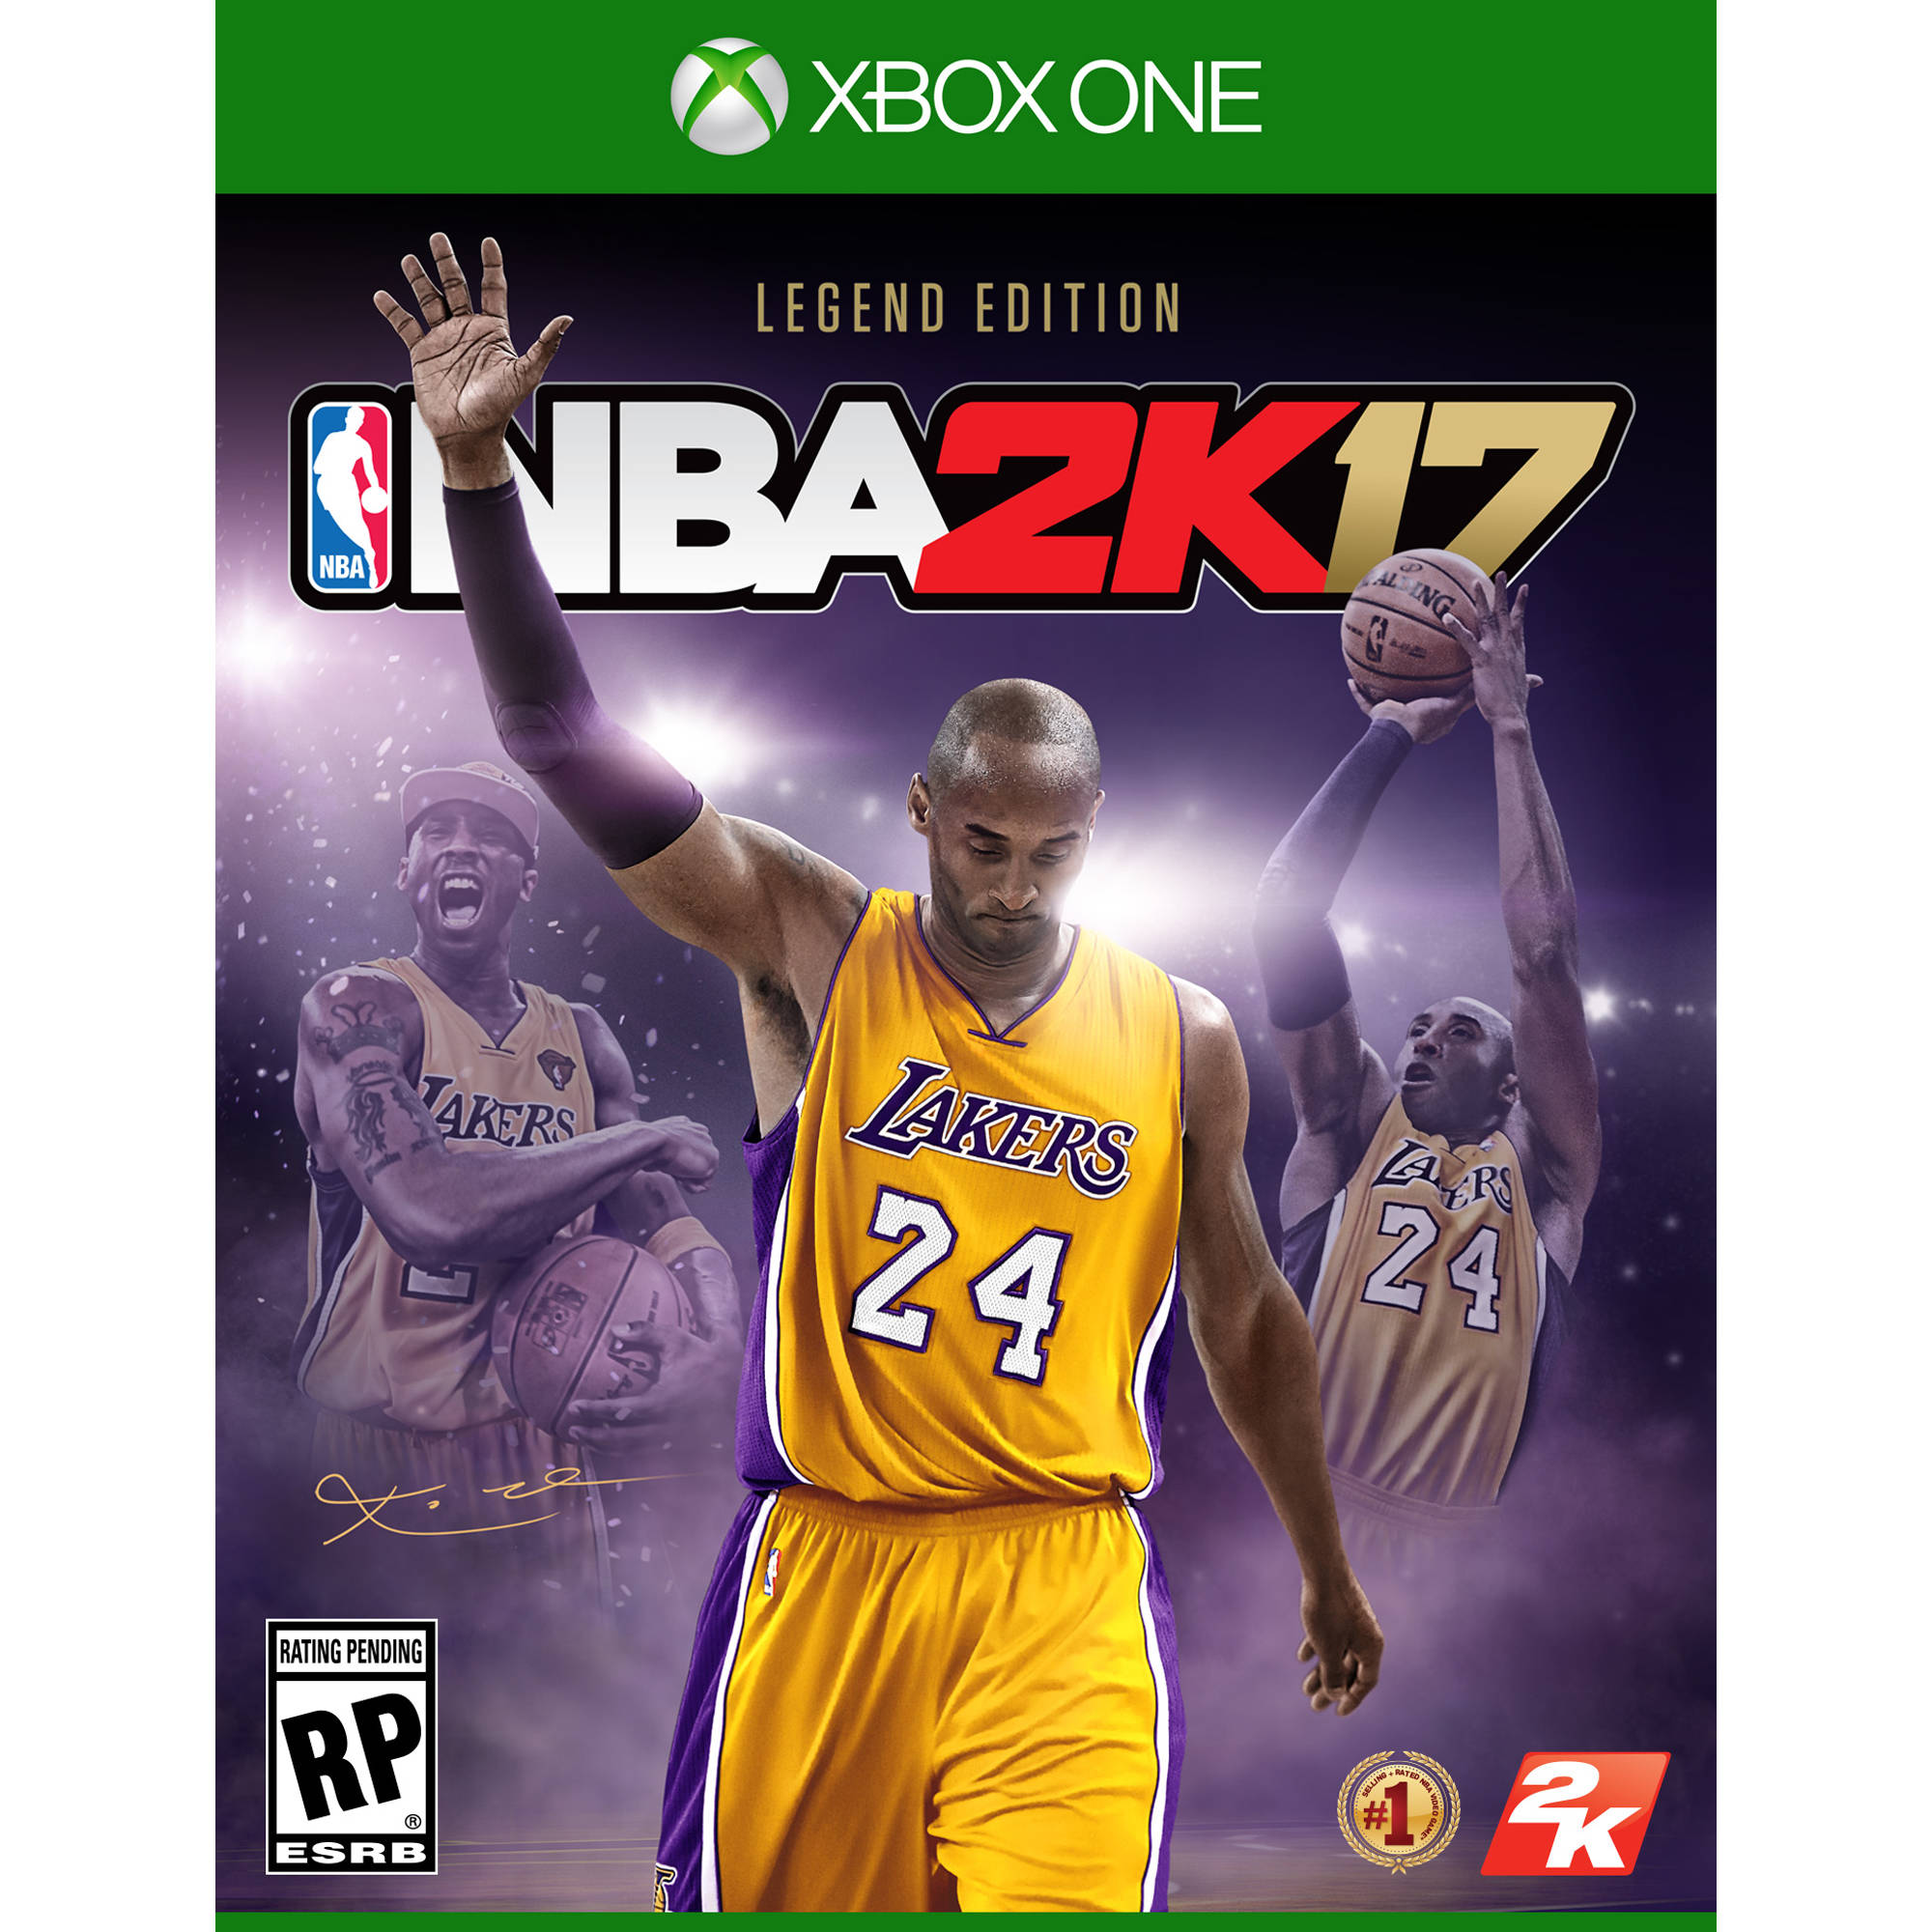 Take Two Nba 2k17 Legend Edition Xbox One